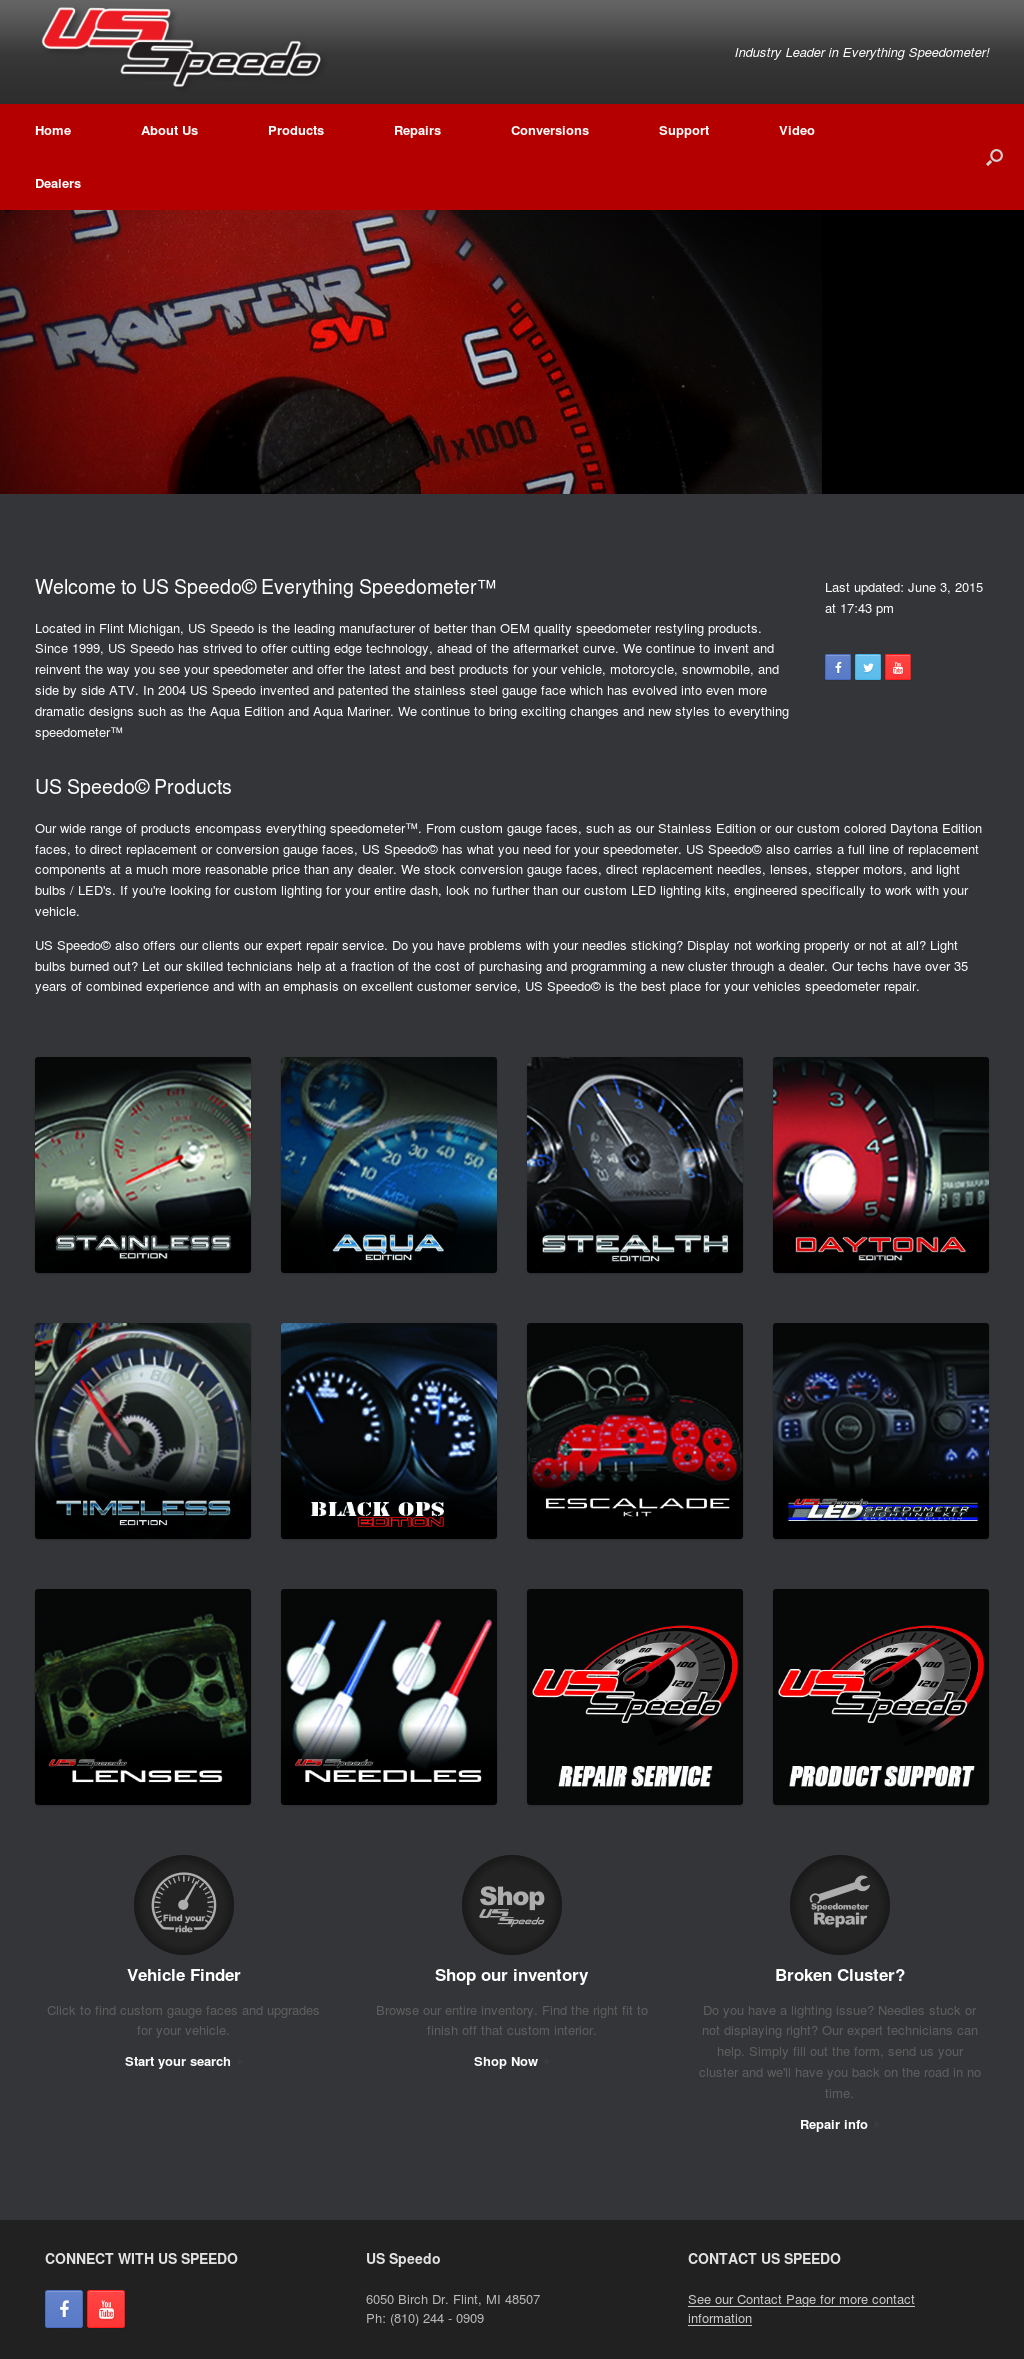 Us Speedo Competitors, Revenue and Employees - Owler Company Profile